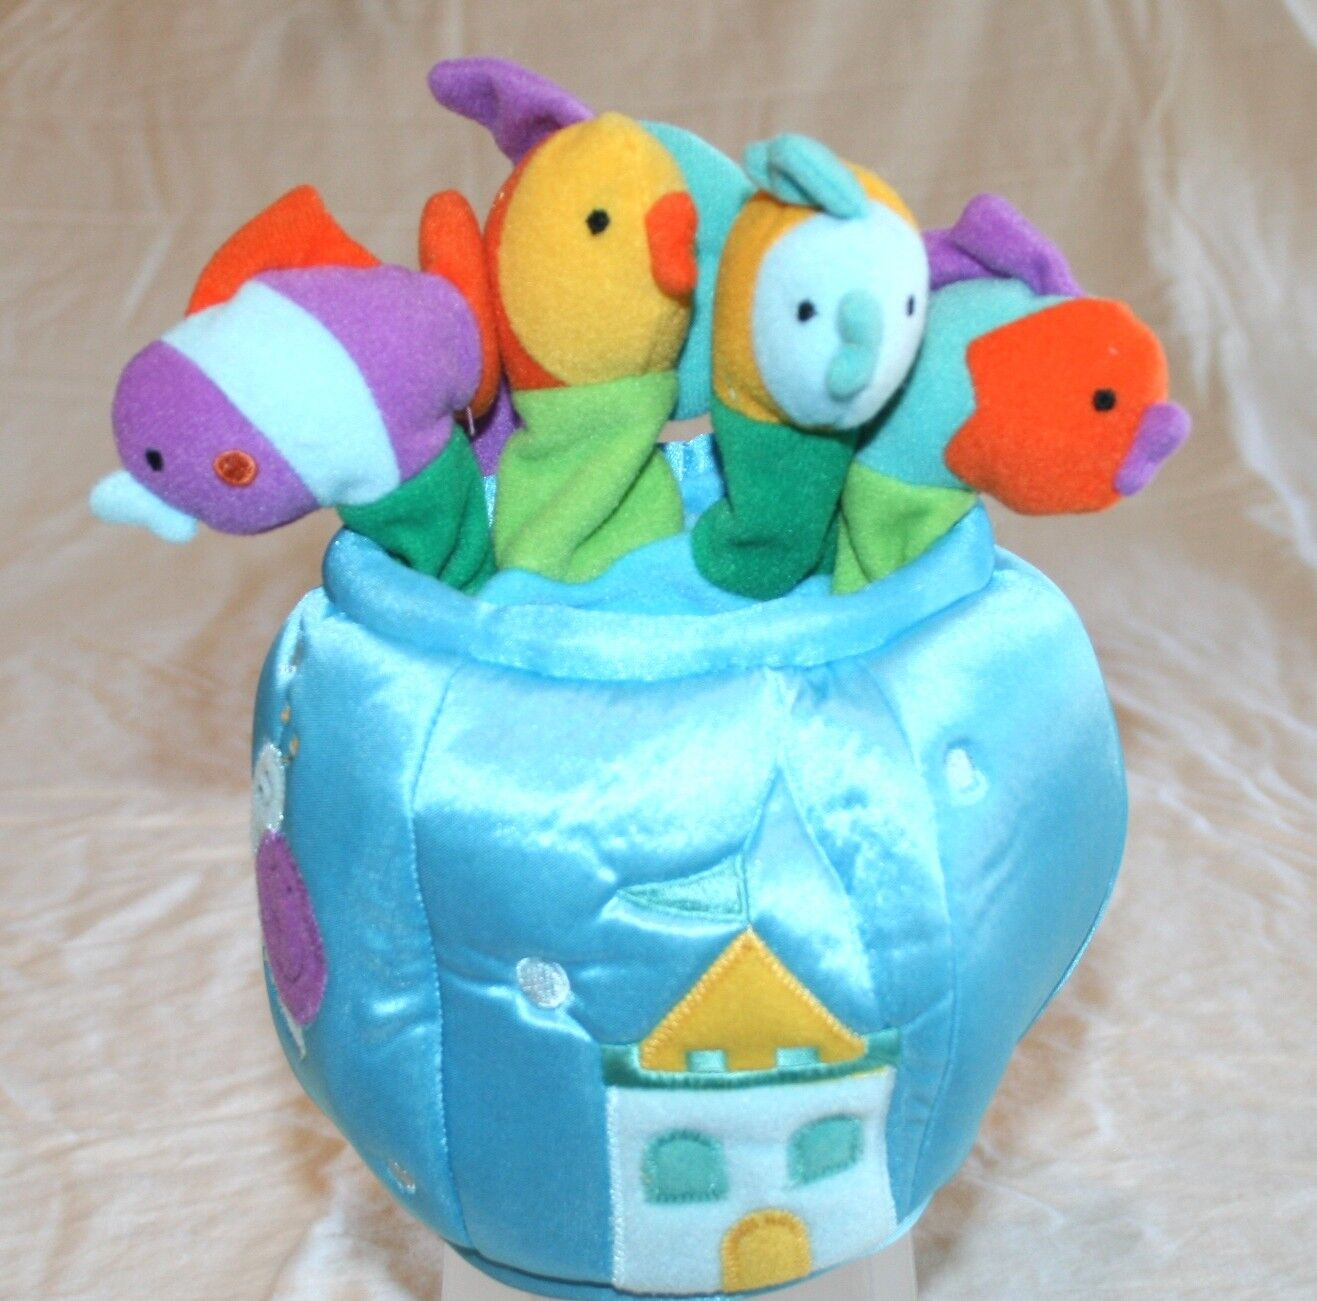 Manhattan Toy - Bowl of Fish Hand Puppet